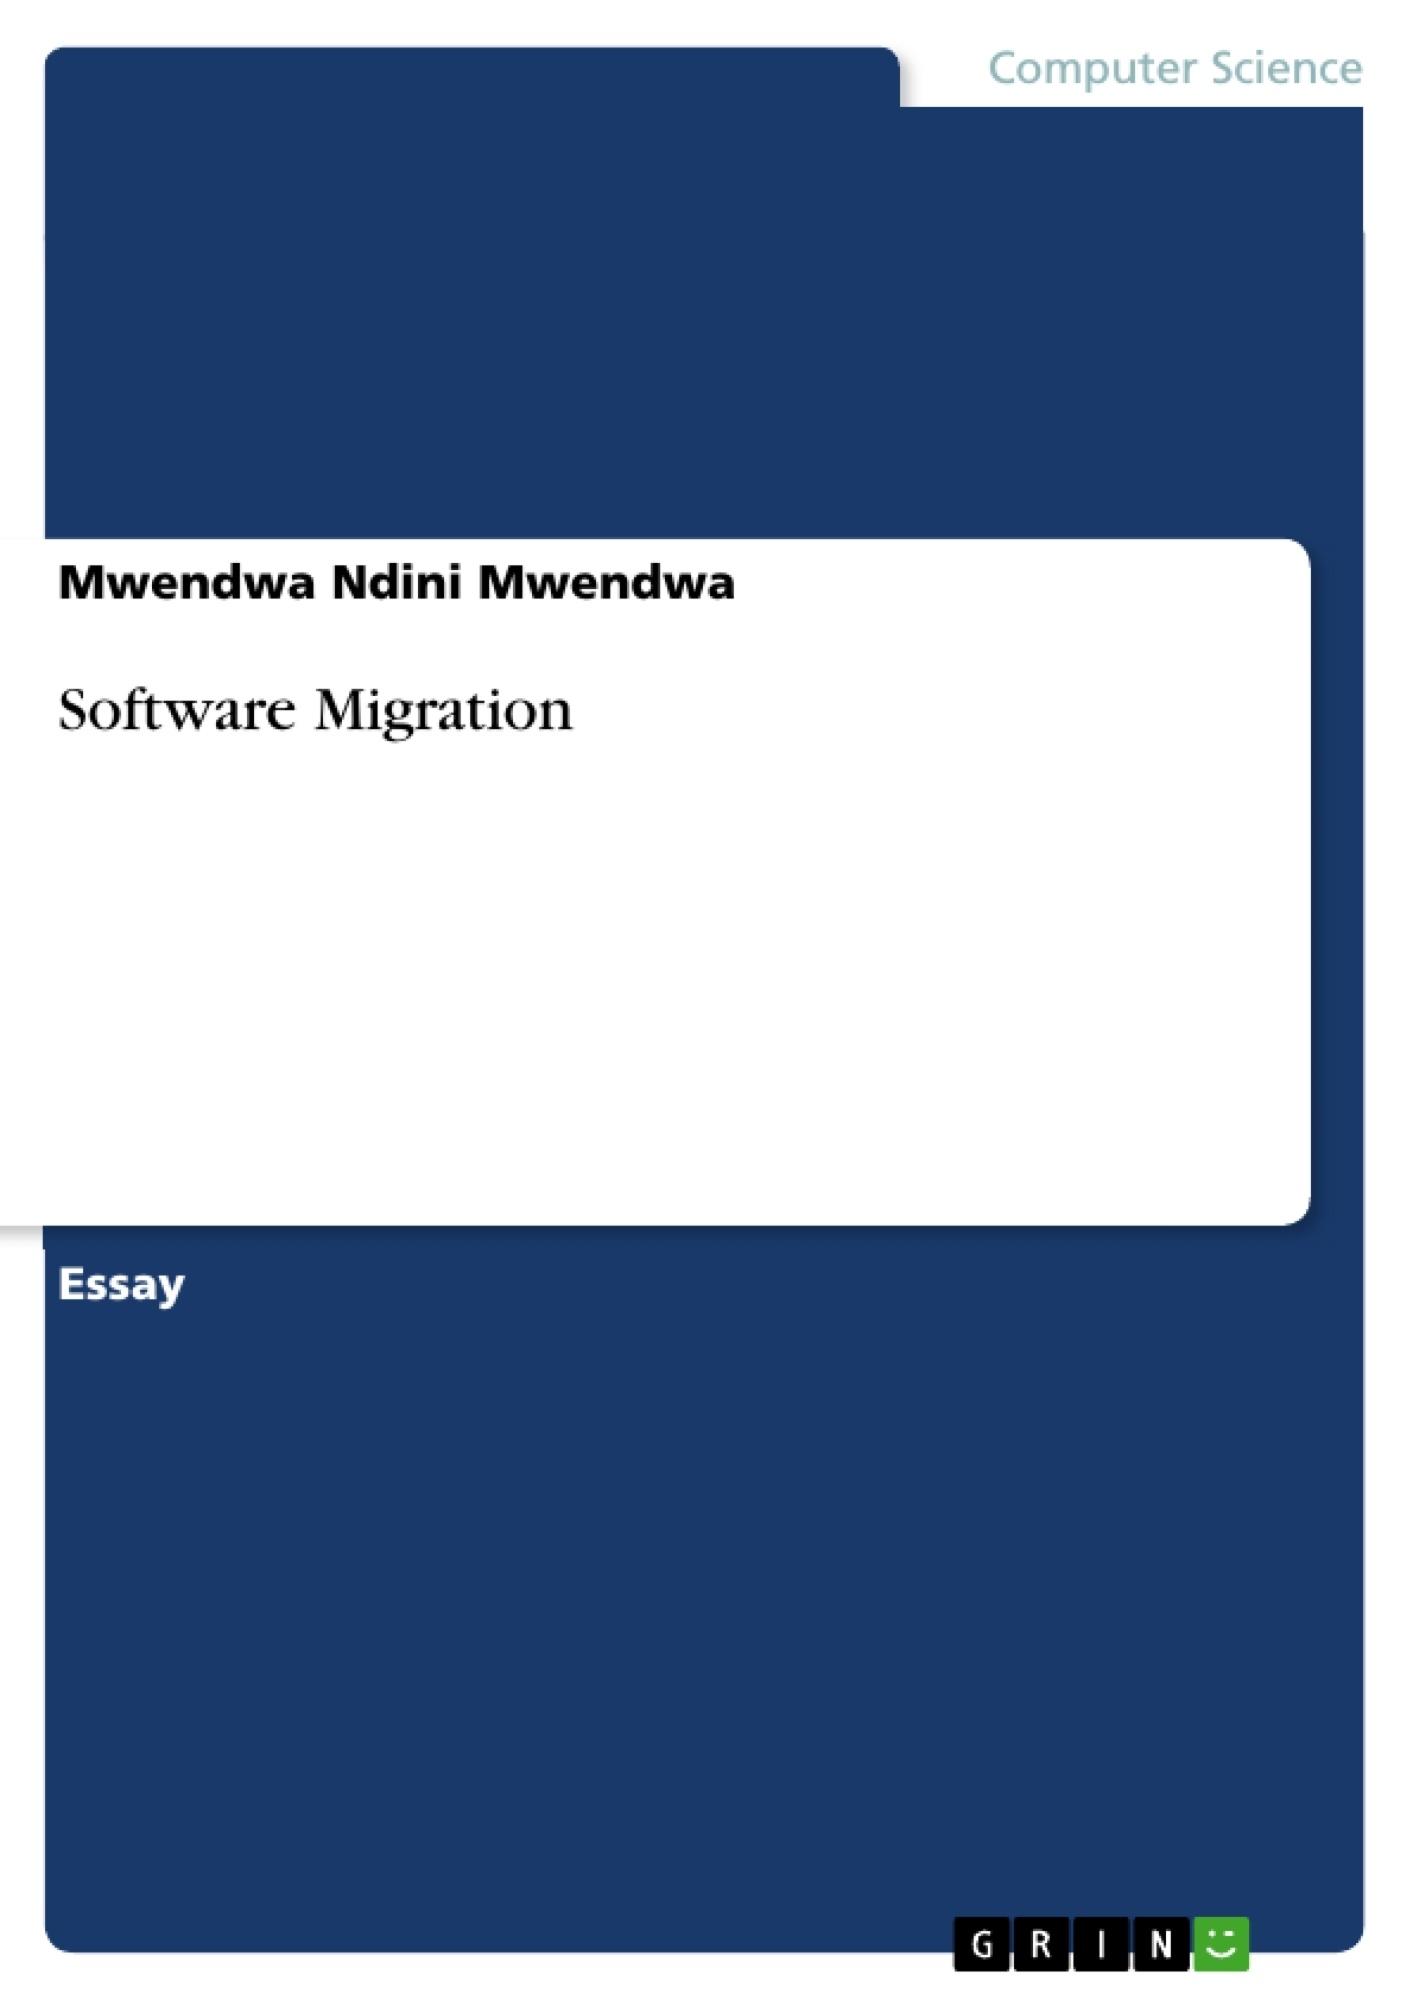 Title: Software Migration